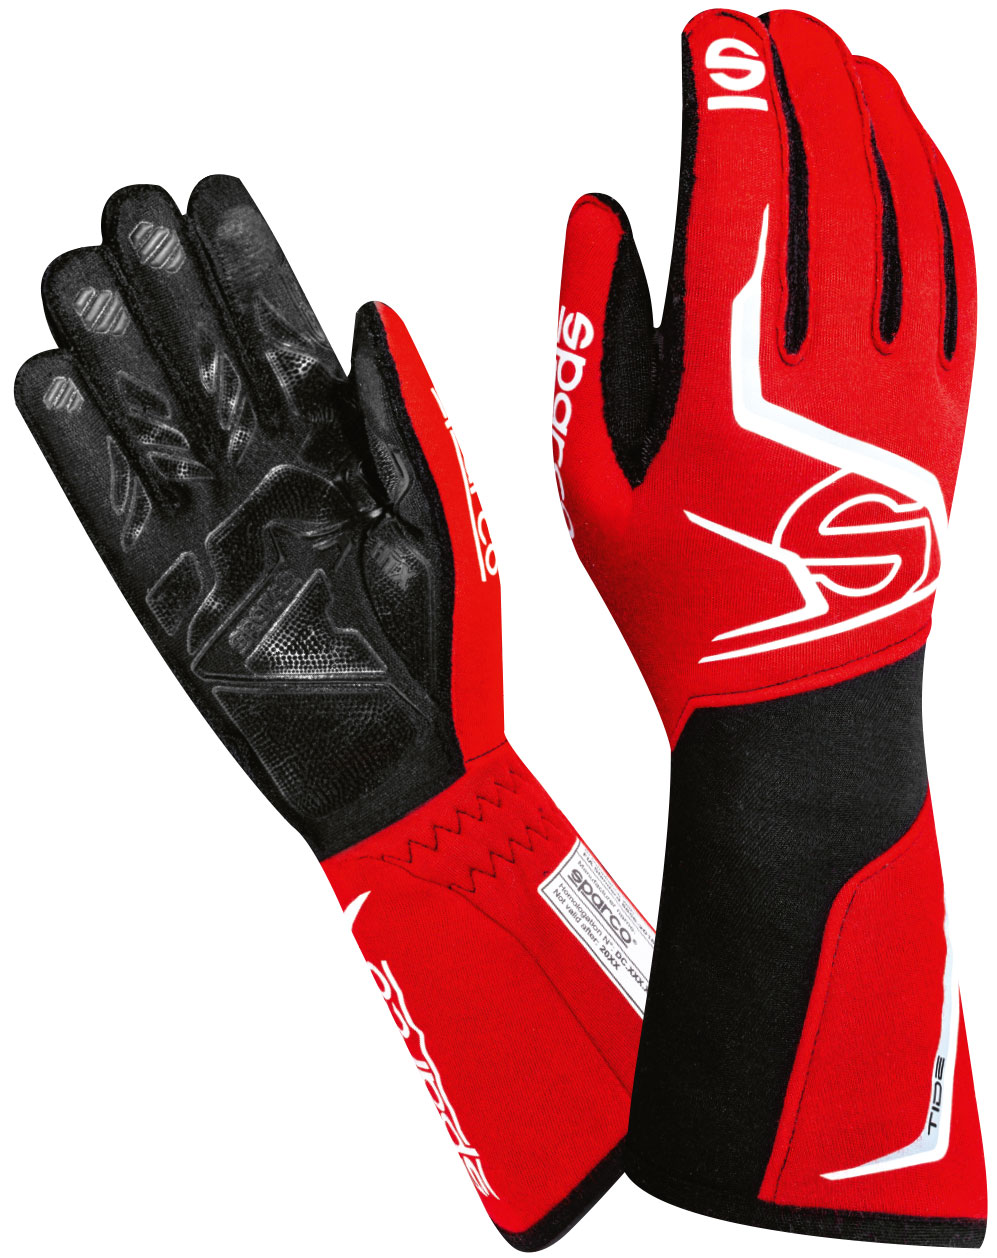 Sparco Handschuh Tide, rot/schwarz